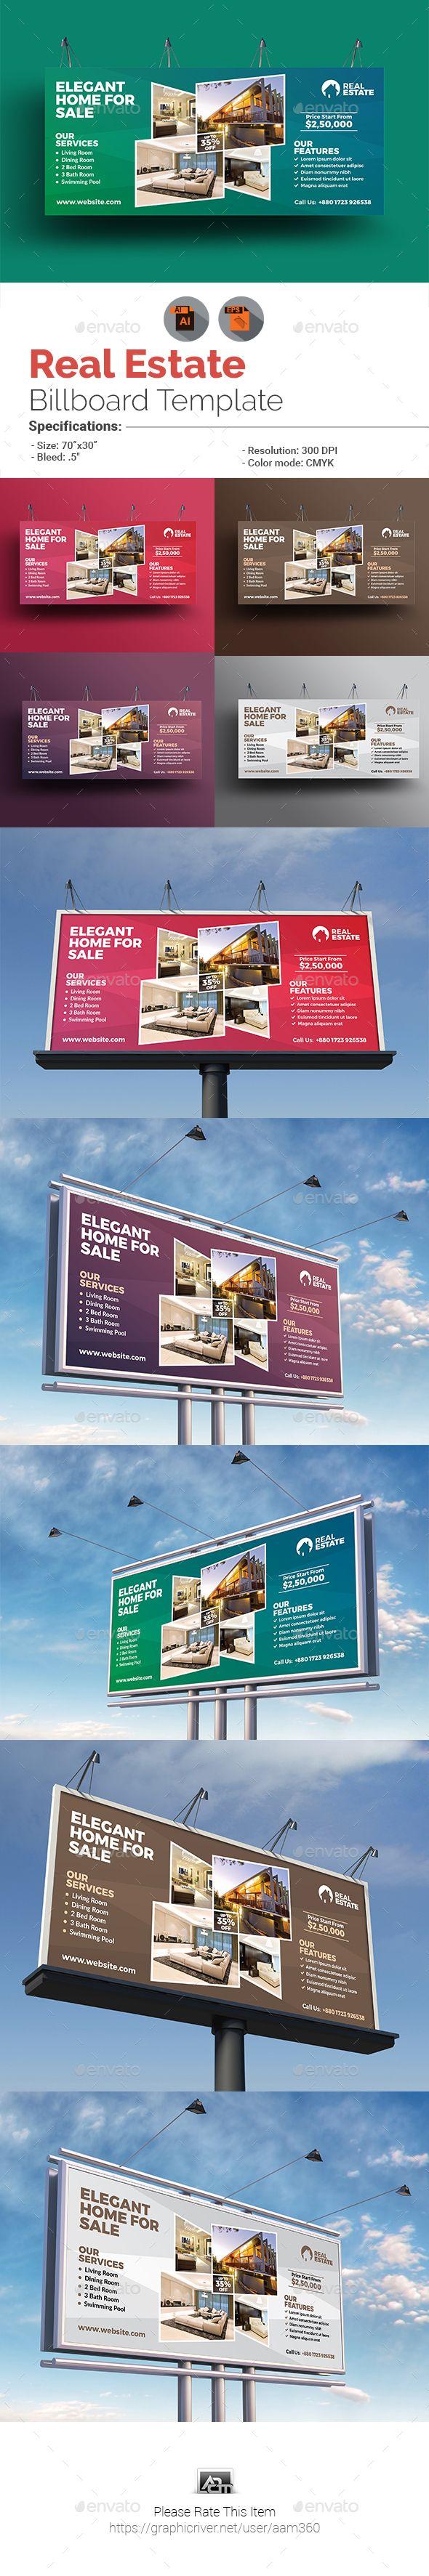 Real Estate Billboard Template Vector Eps Ai Illustrator